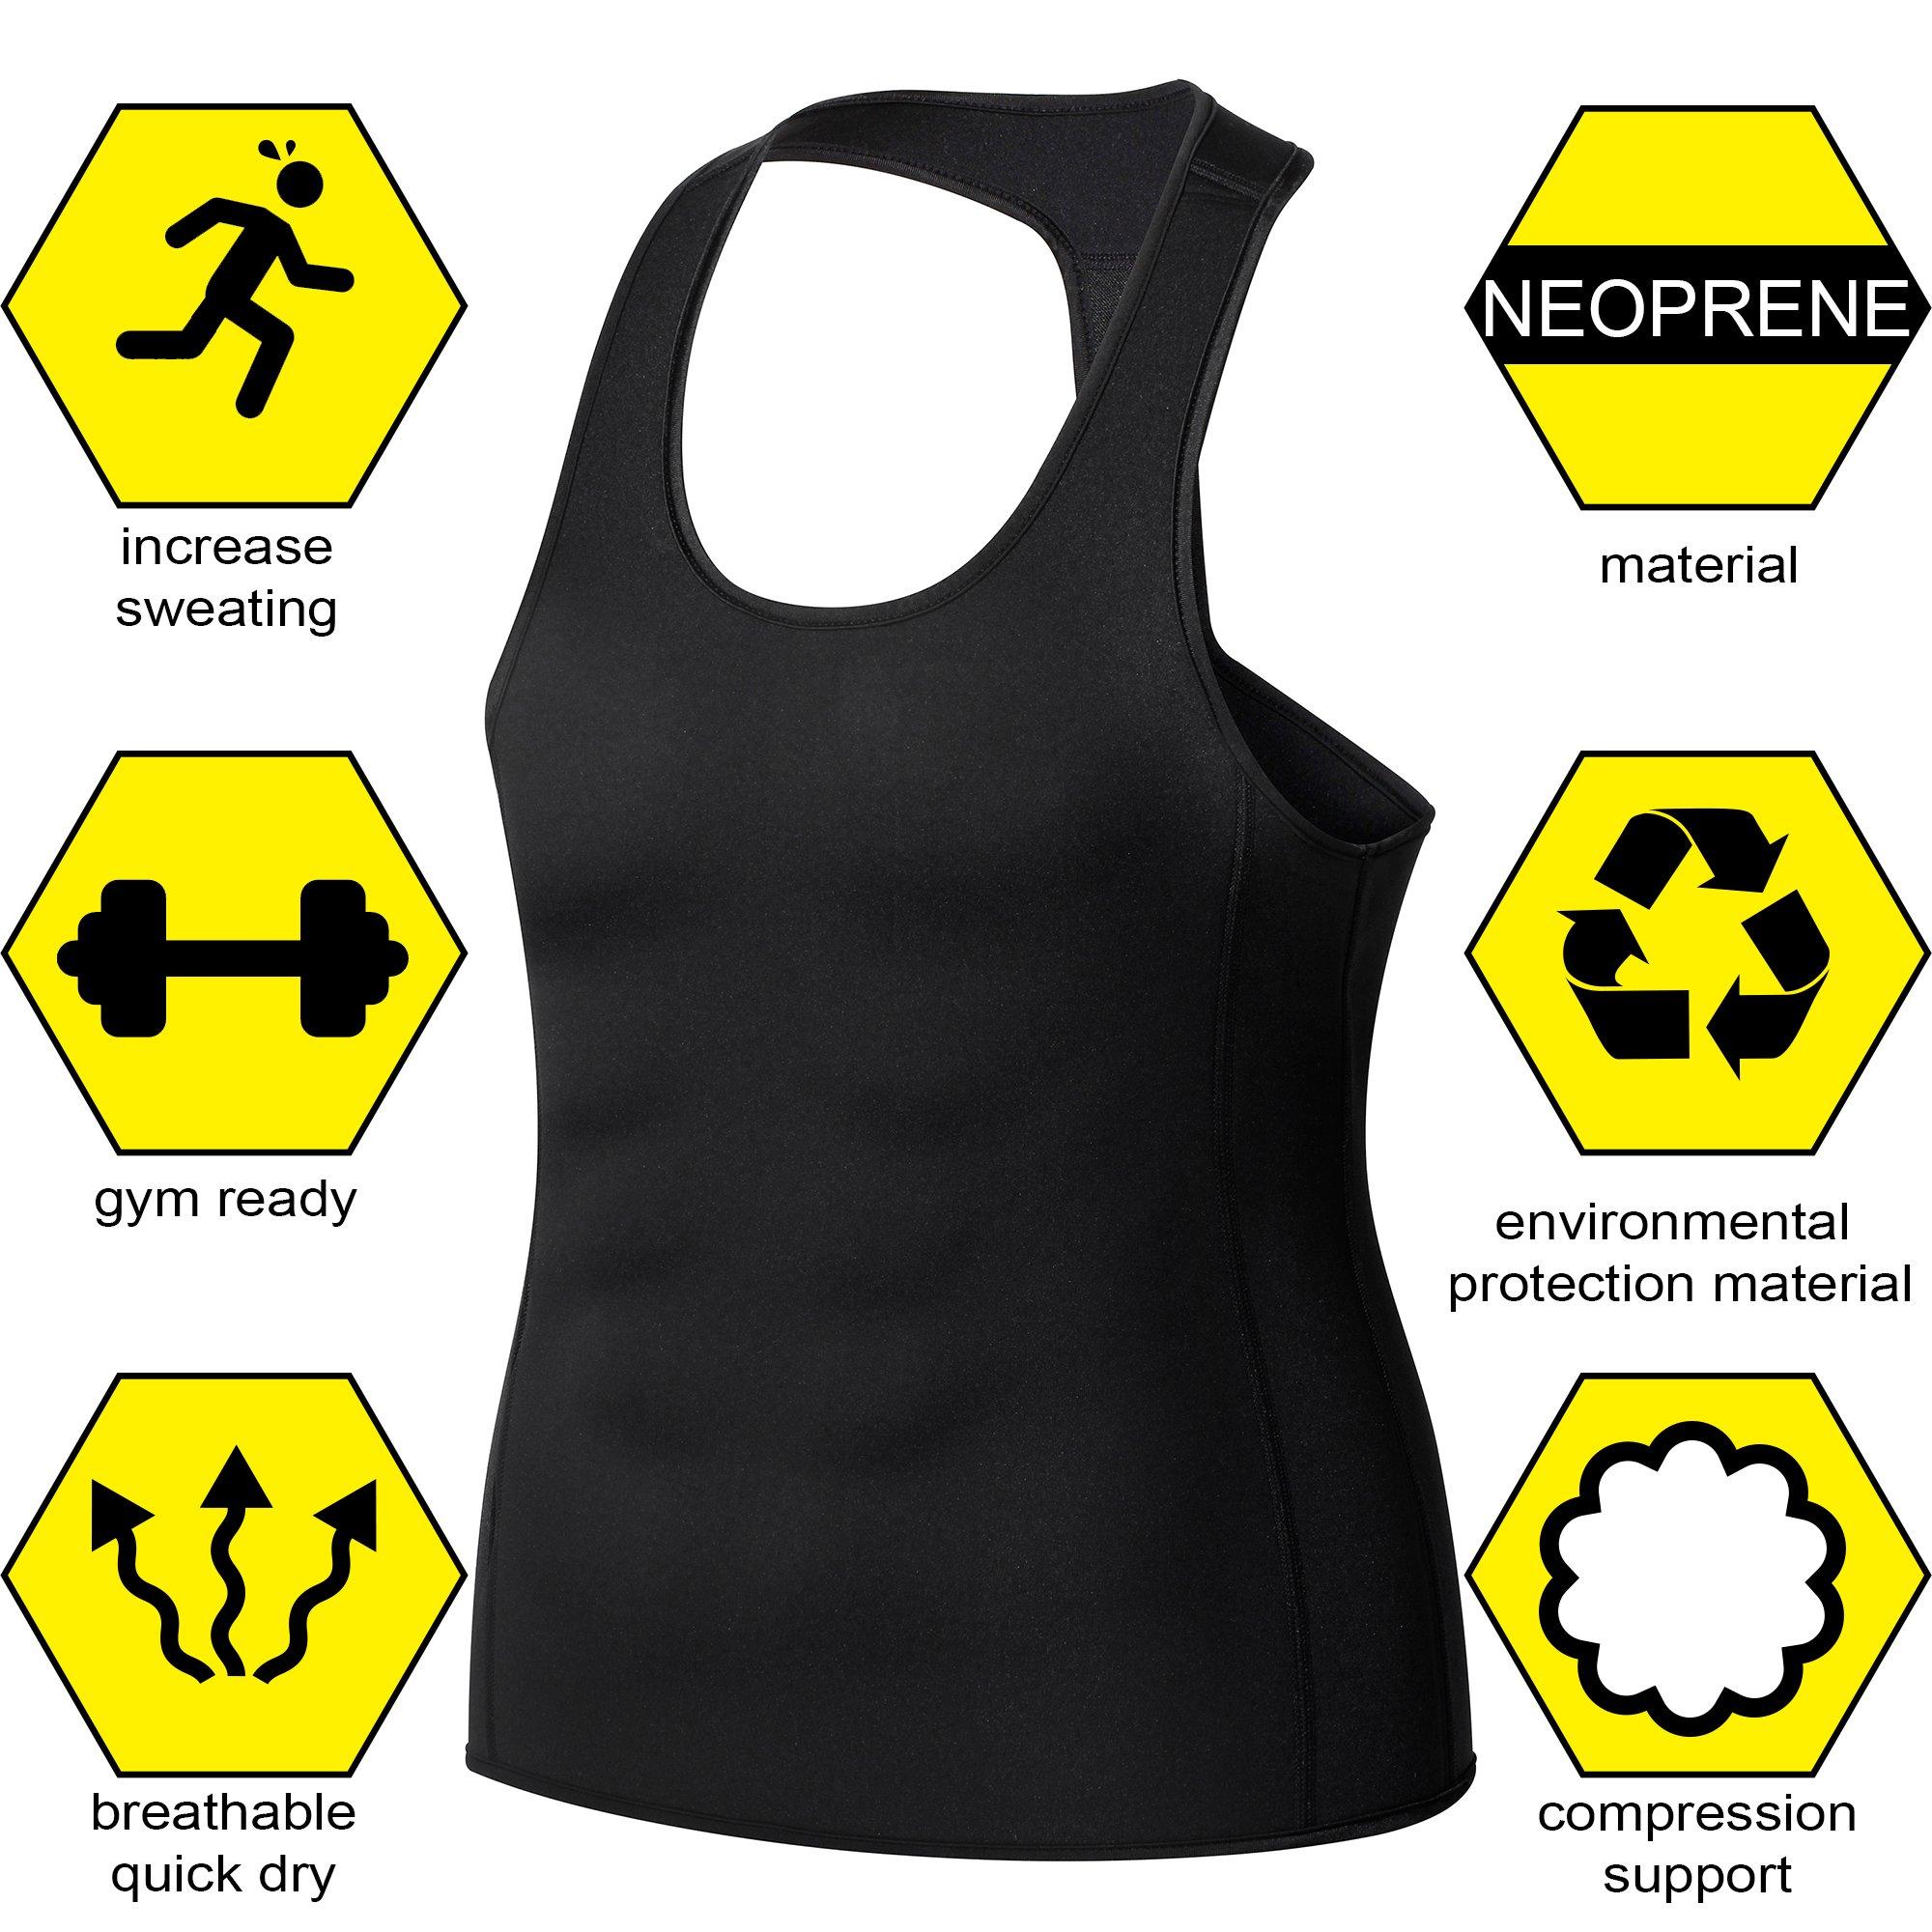 f96dbfe4d5222 Junlan Men Workout Tank Top Vest Gym Shirt Weight Loss Dress Waist Body  Shaper Sauna Suit Slim Corset Compression Clothes   Accessories   Sports    Outdoors ...